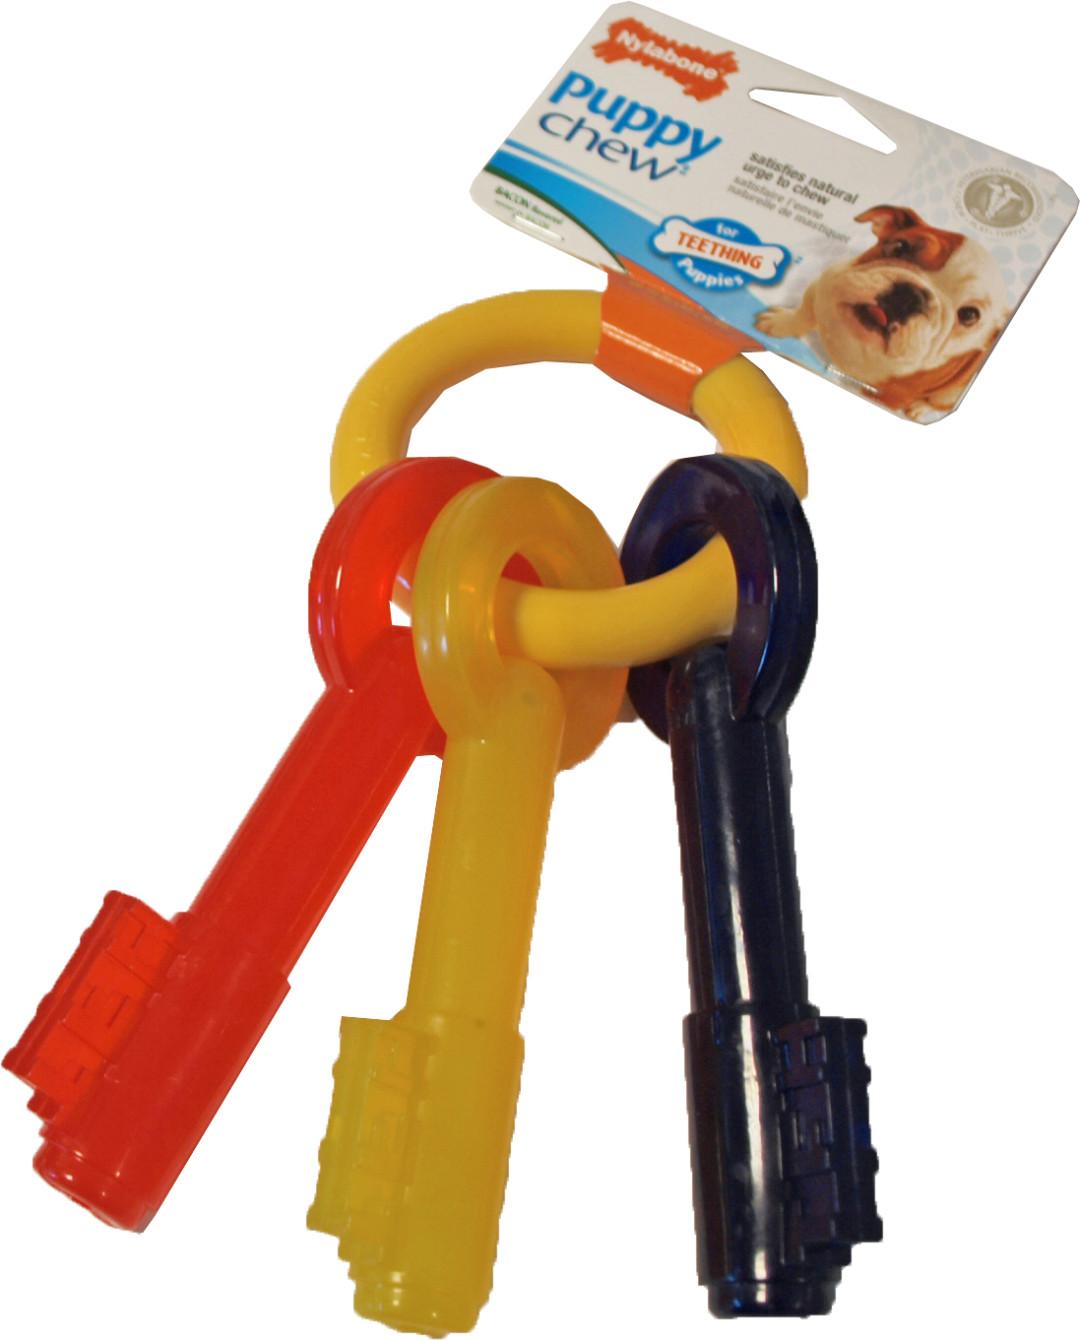 NylaBone Puppy Chew Teething Key M